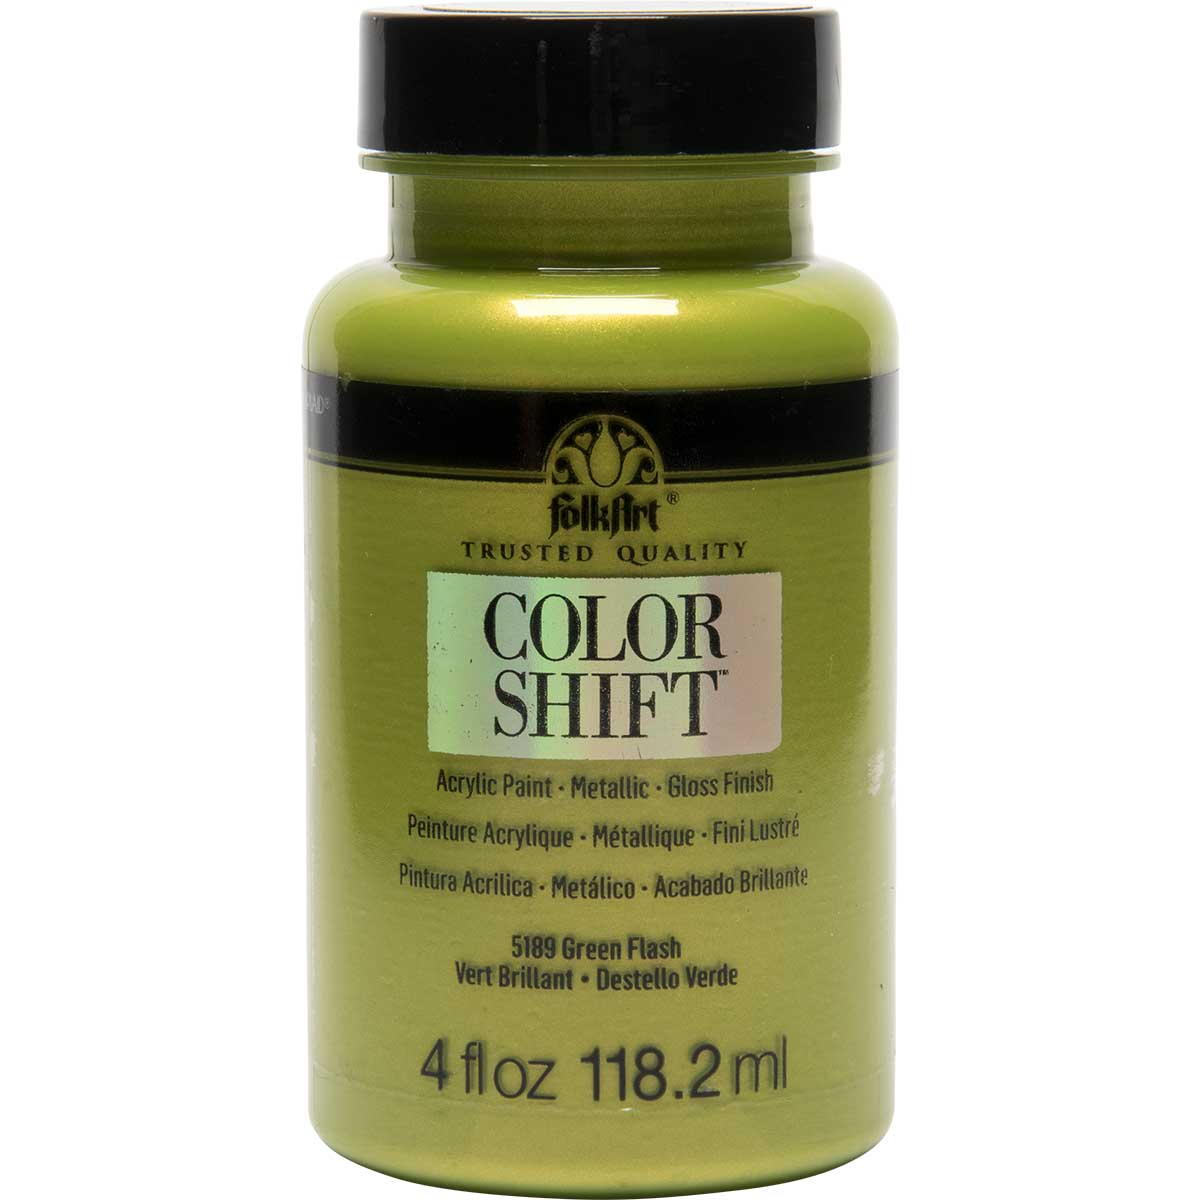 FolkArt ® Color Shift™ Acrylic Paint - Green Flash, 4 oz.